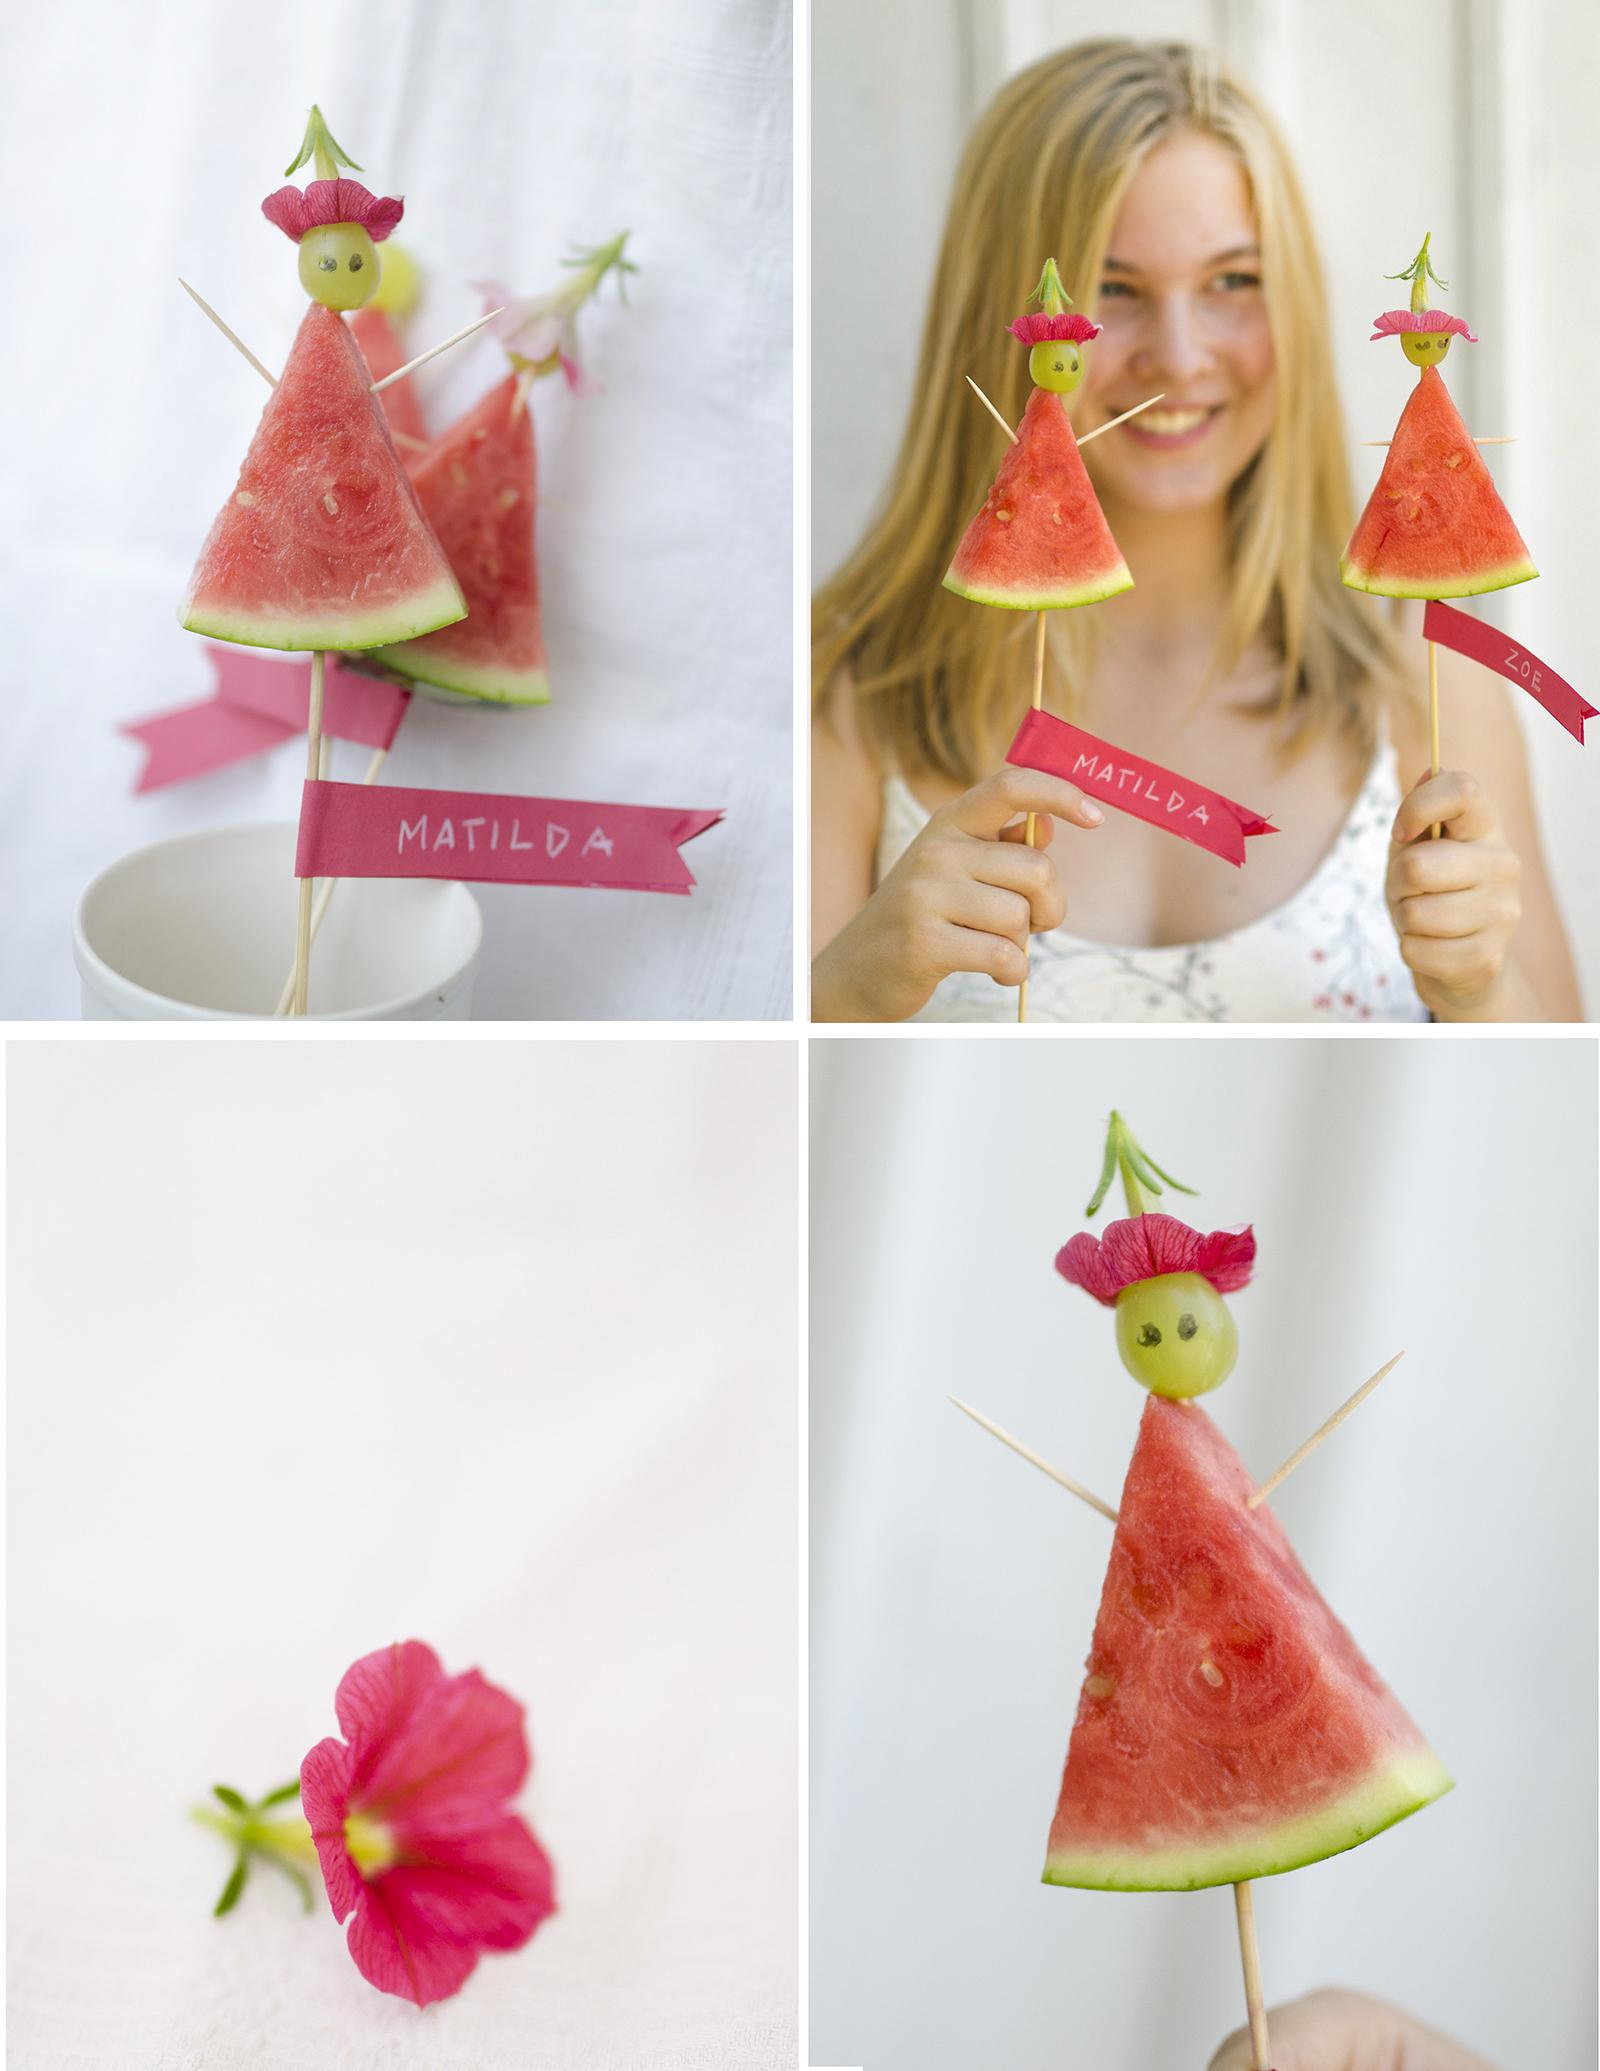 Watermelon FairyQUAD